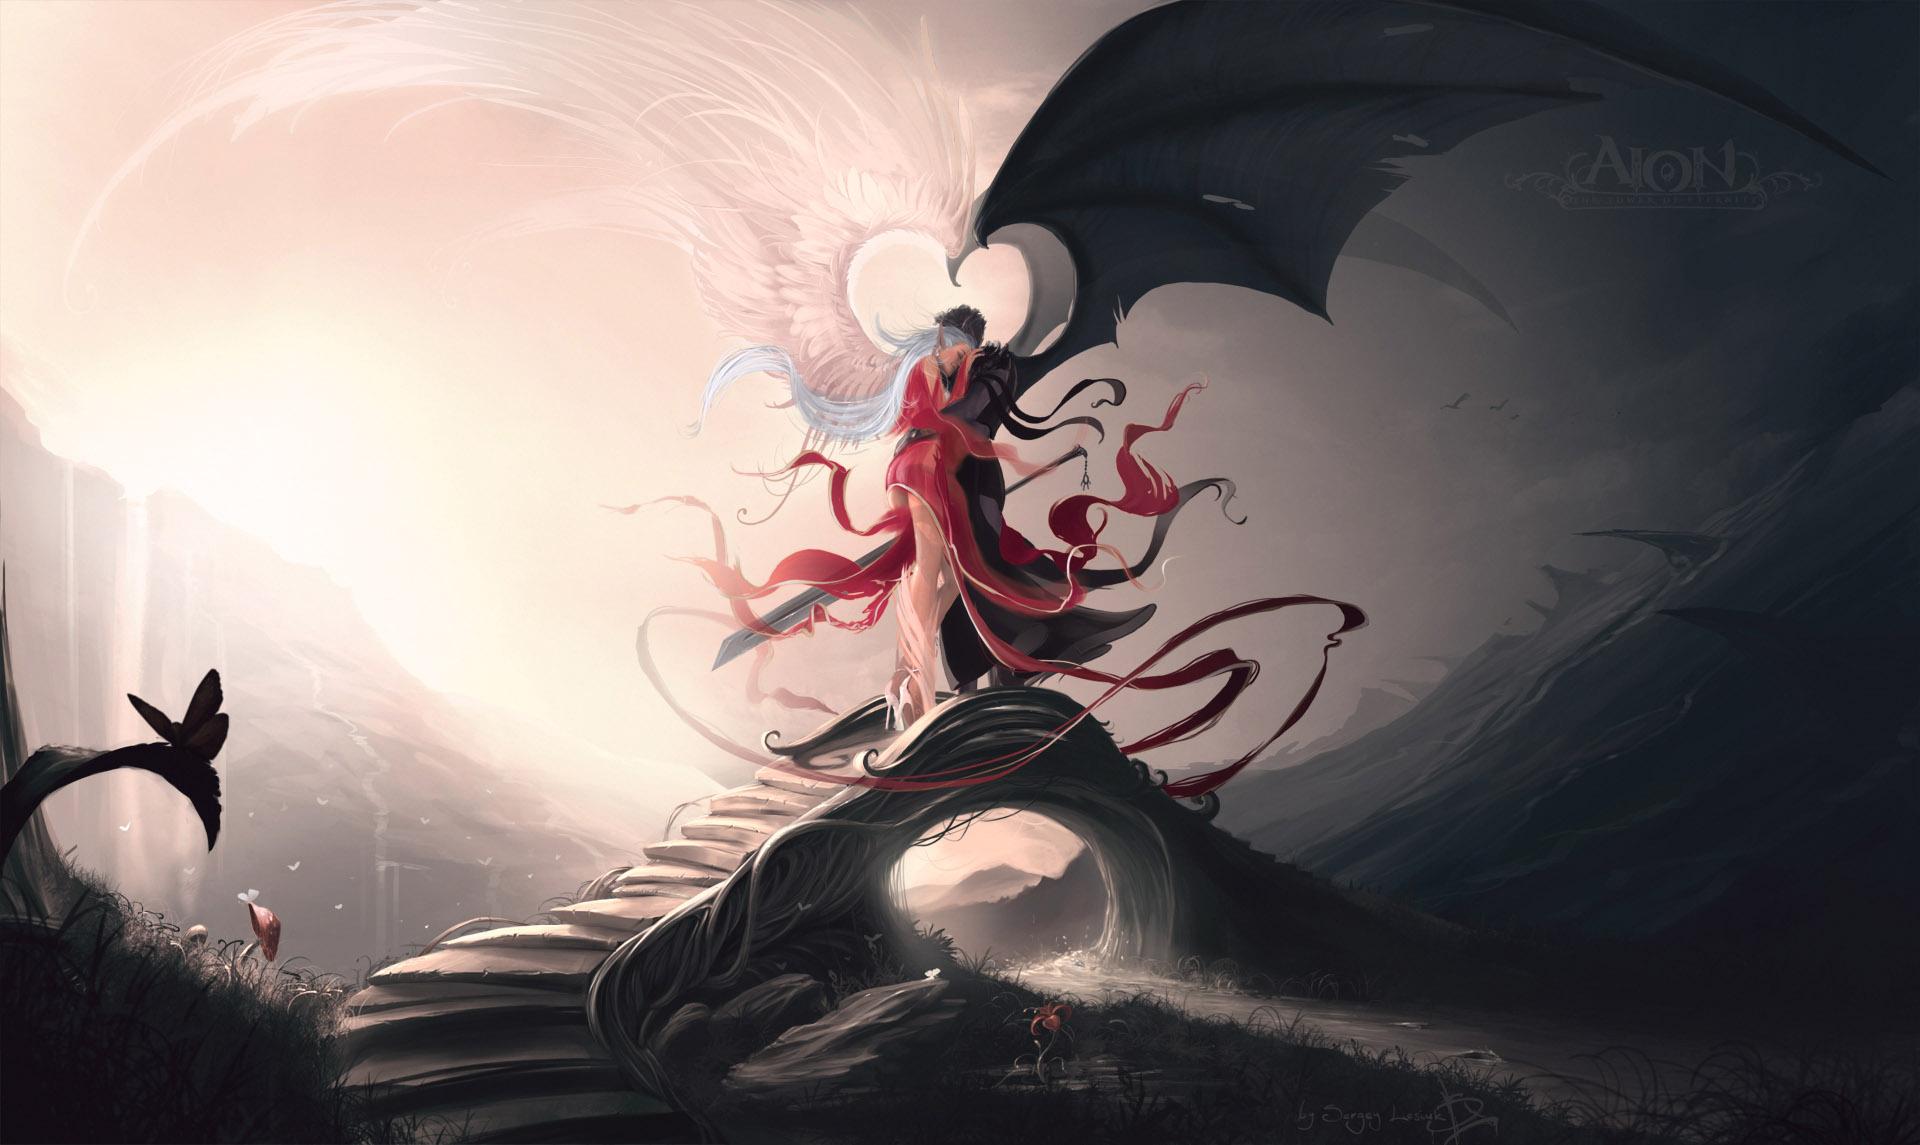 Fantasy - Love  Wings Demon Angel Couple Sword Wallpaper